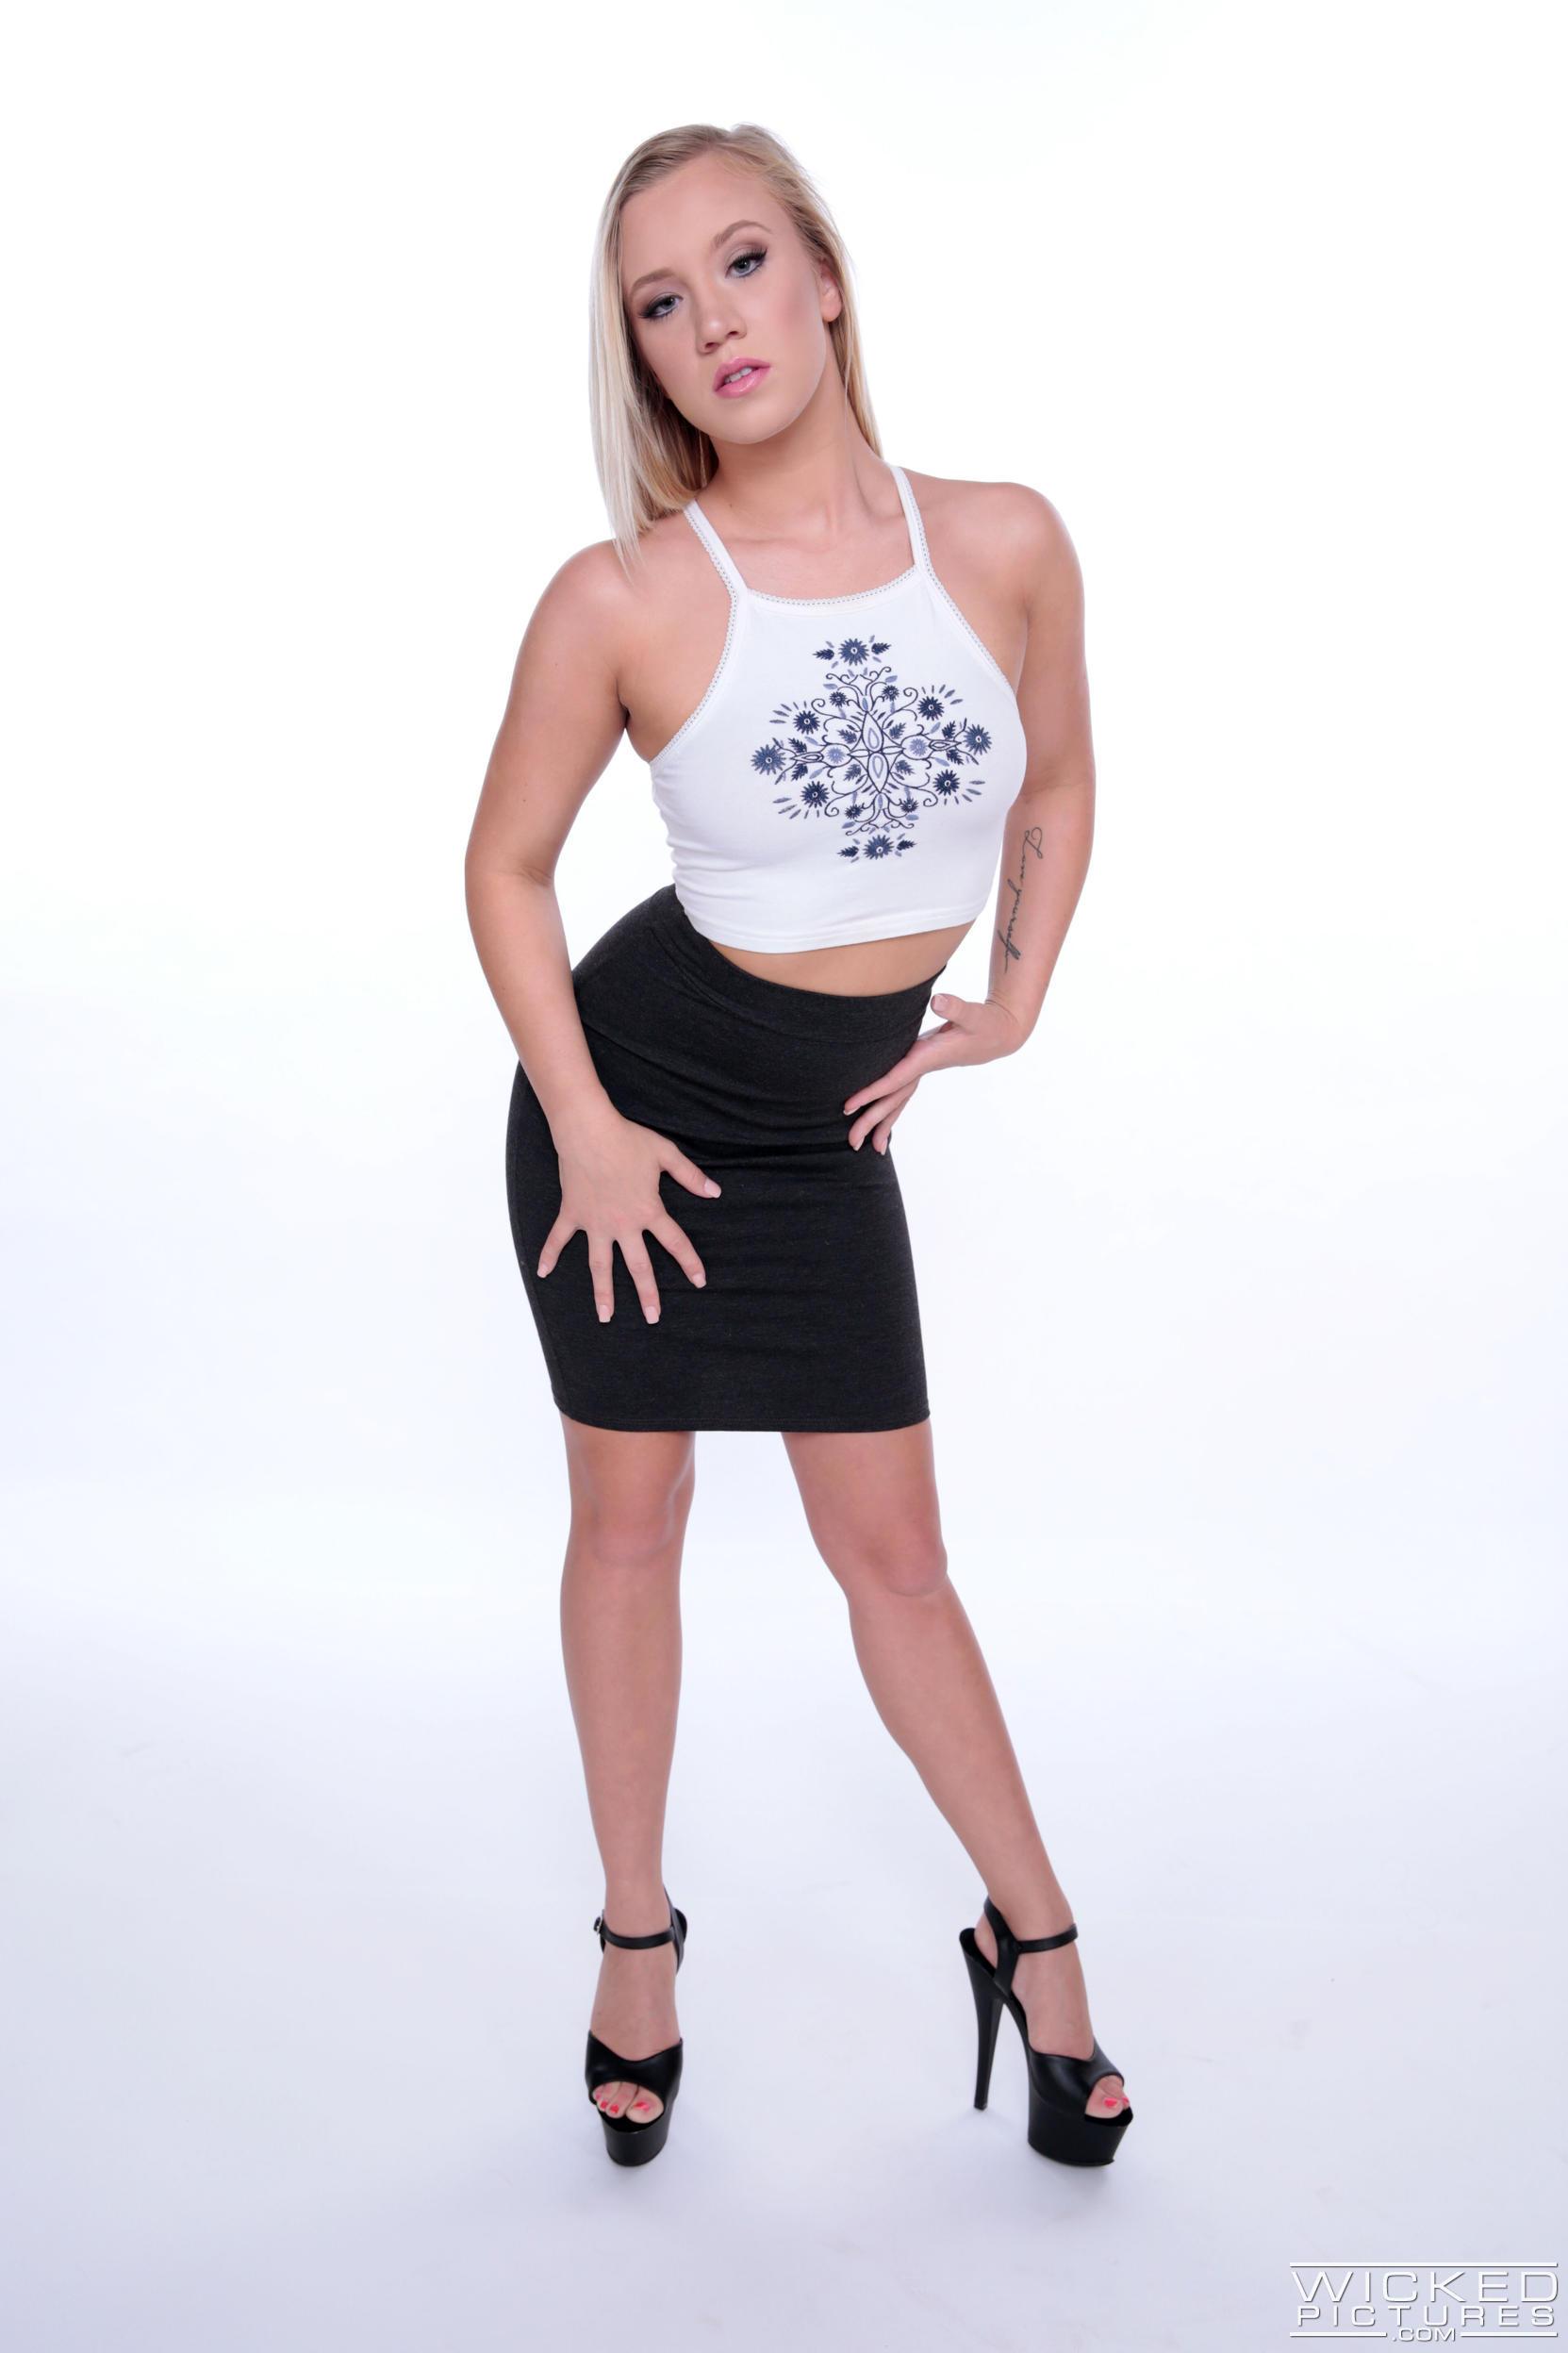 Bailey Brooke bella modelo bailey brooke: wicked - imágenes en taringa!